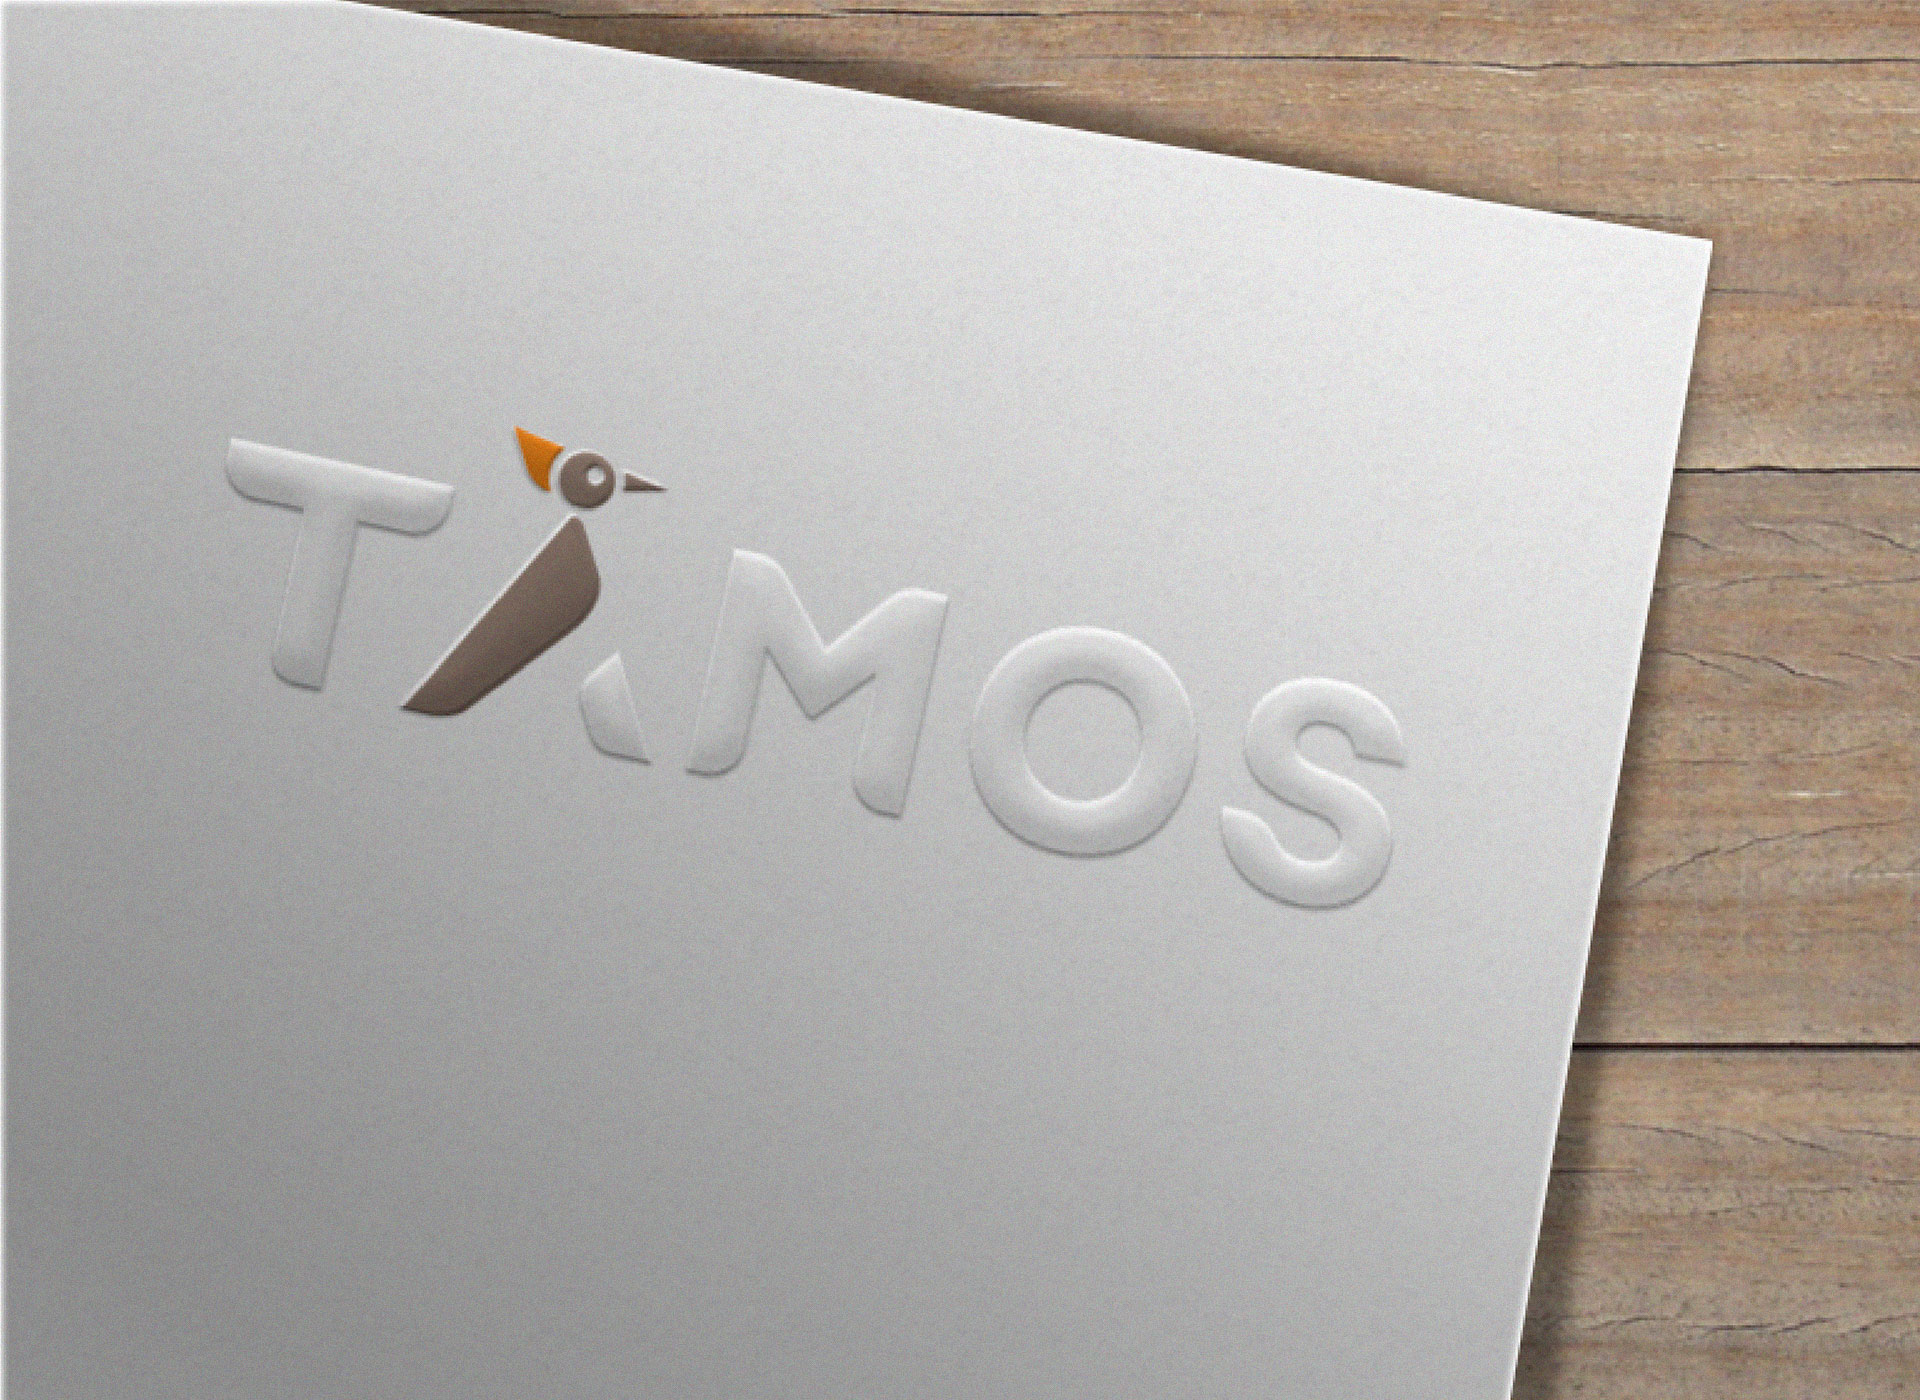 tamos portofoliu inoveo logo